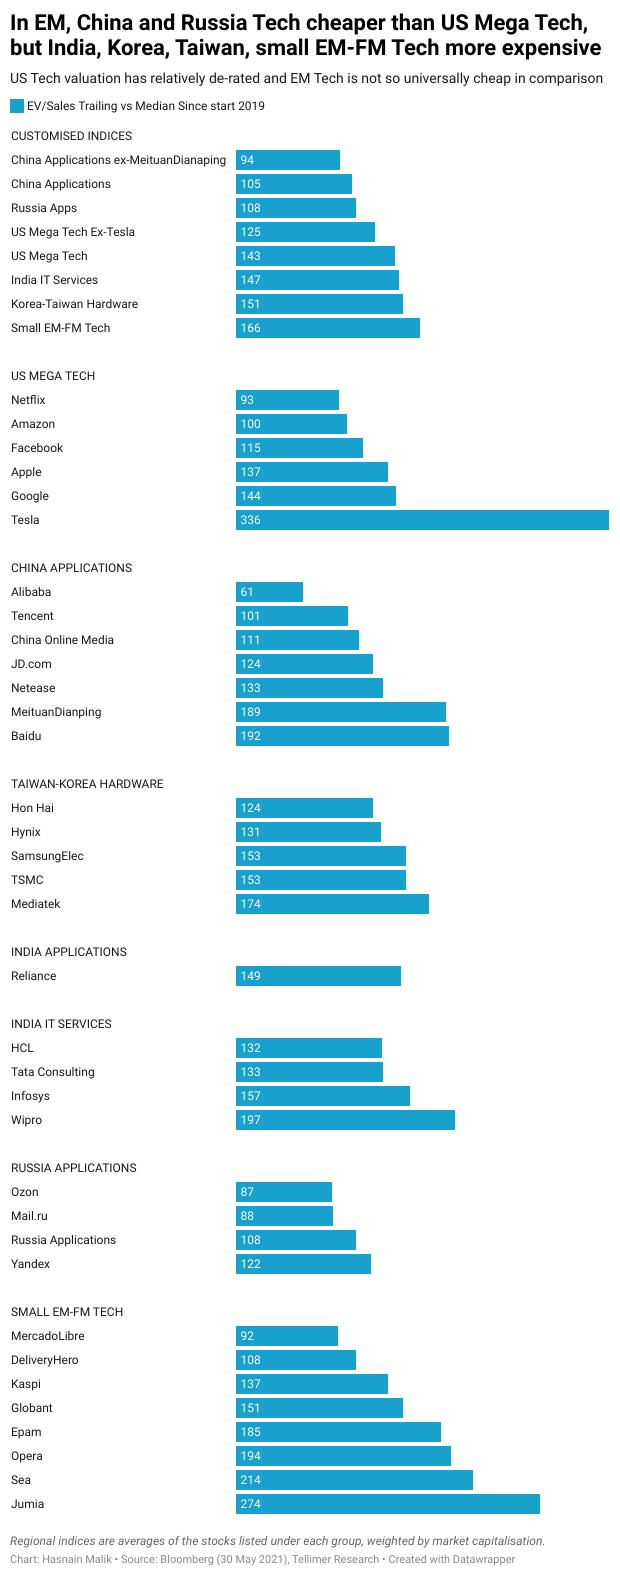 In EM, China and Russia Tech cheaper than US Mega Tech, but India, Korea, Taiwan, small EM-FM Tech more expensive